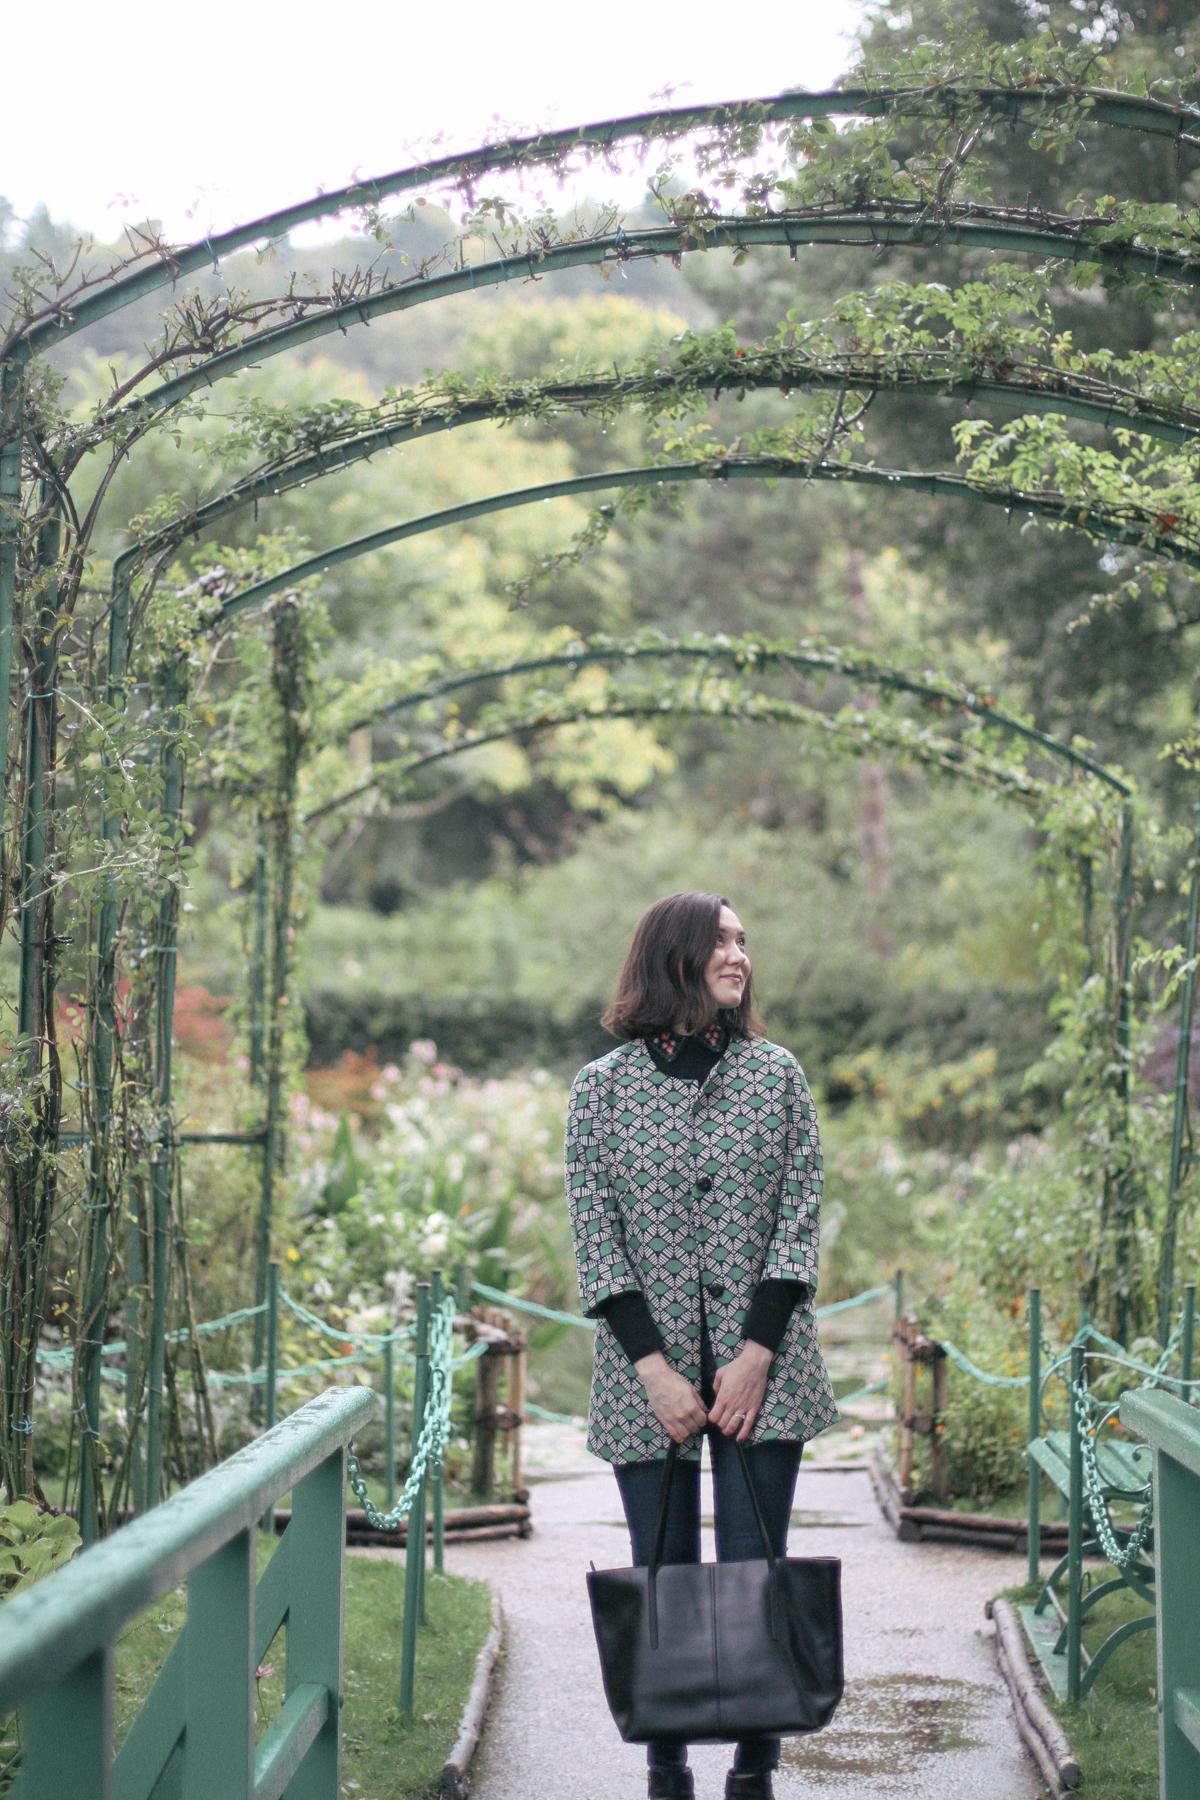 Giverny-7.jpg